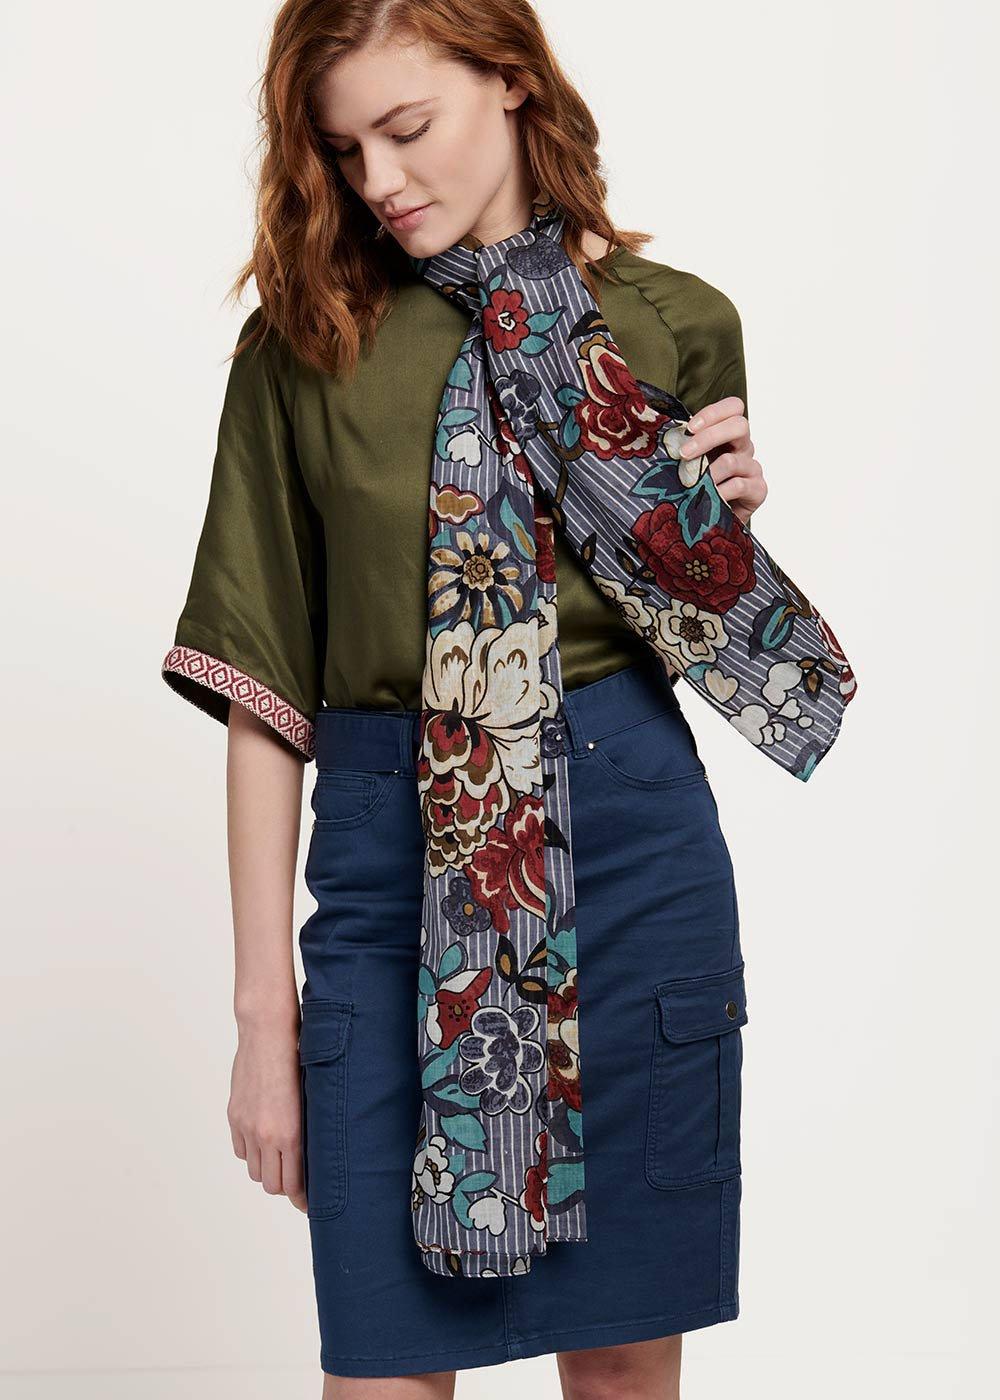 Samir scarf with spring print - Fog / Bordeaux Fantasia - Woman